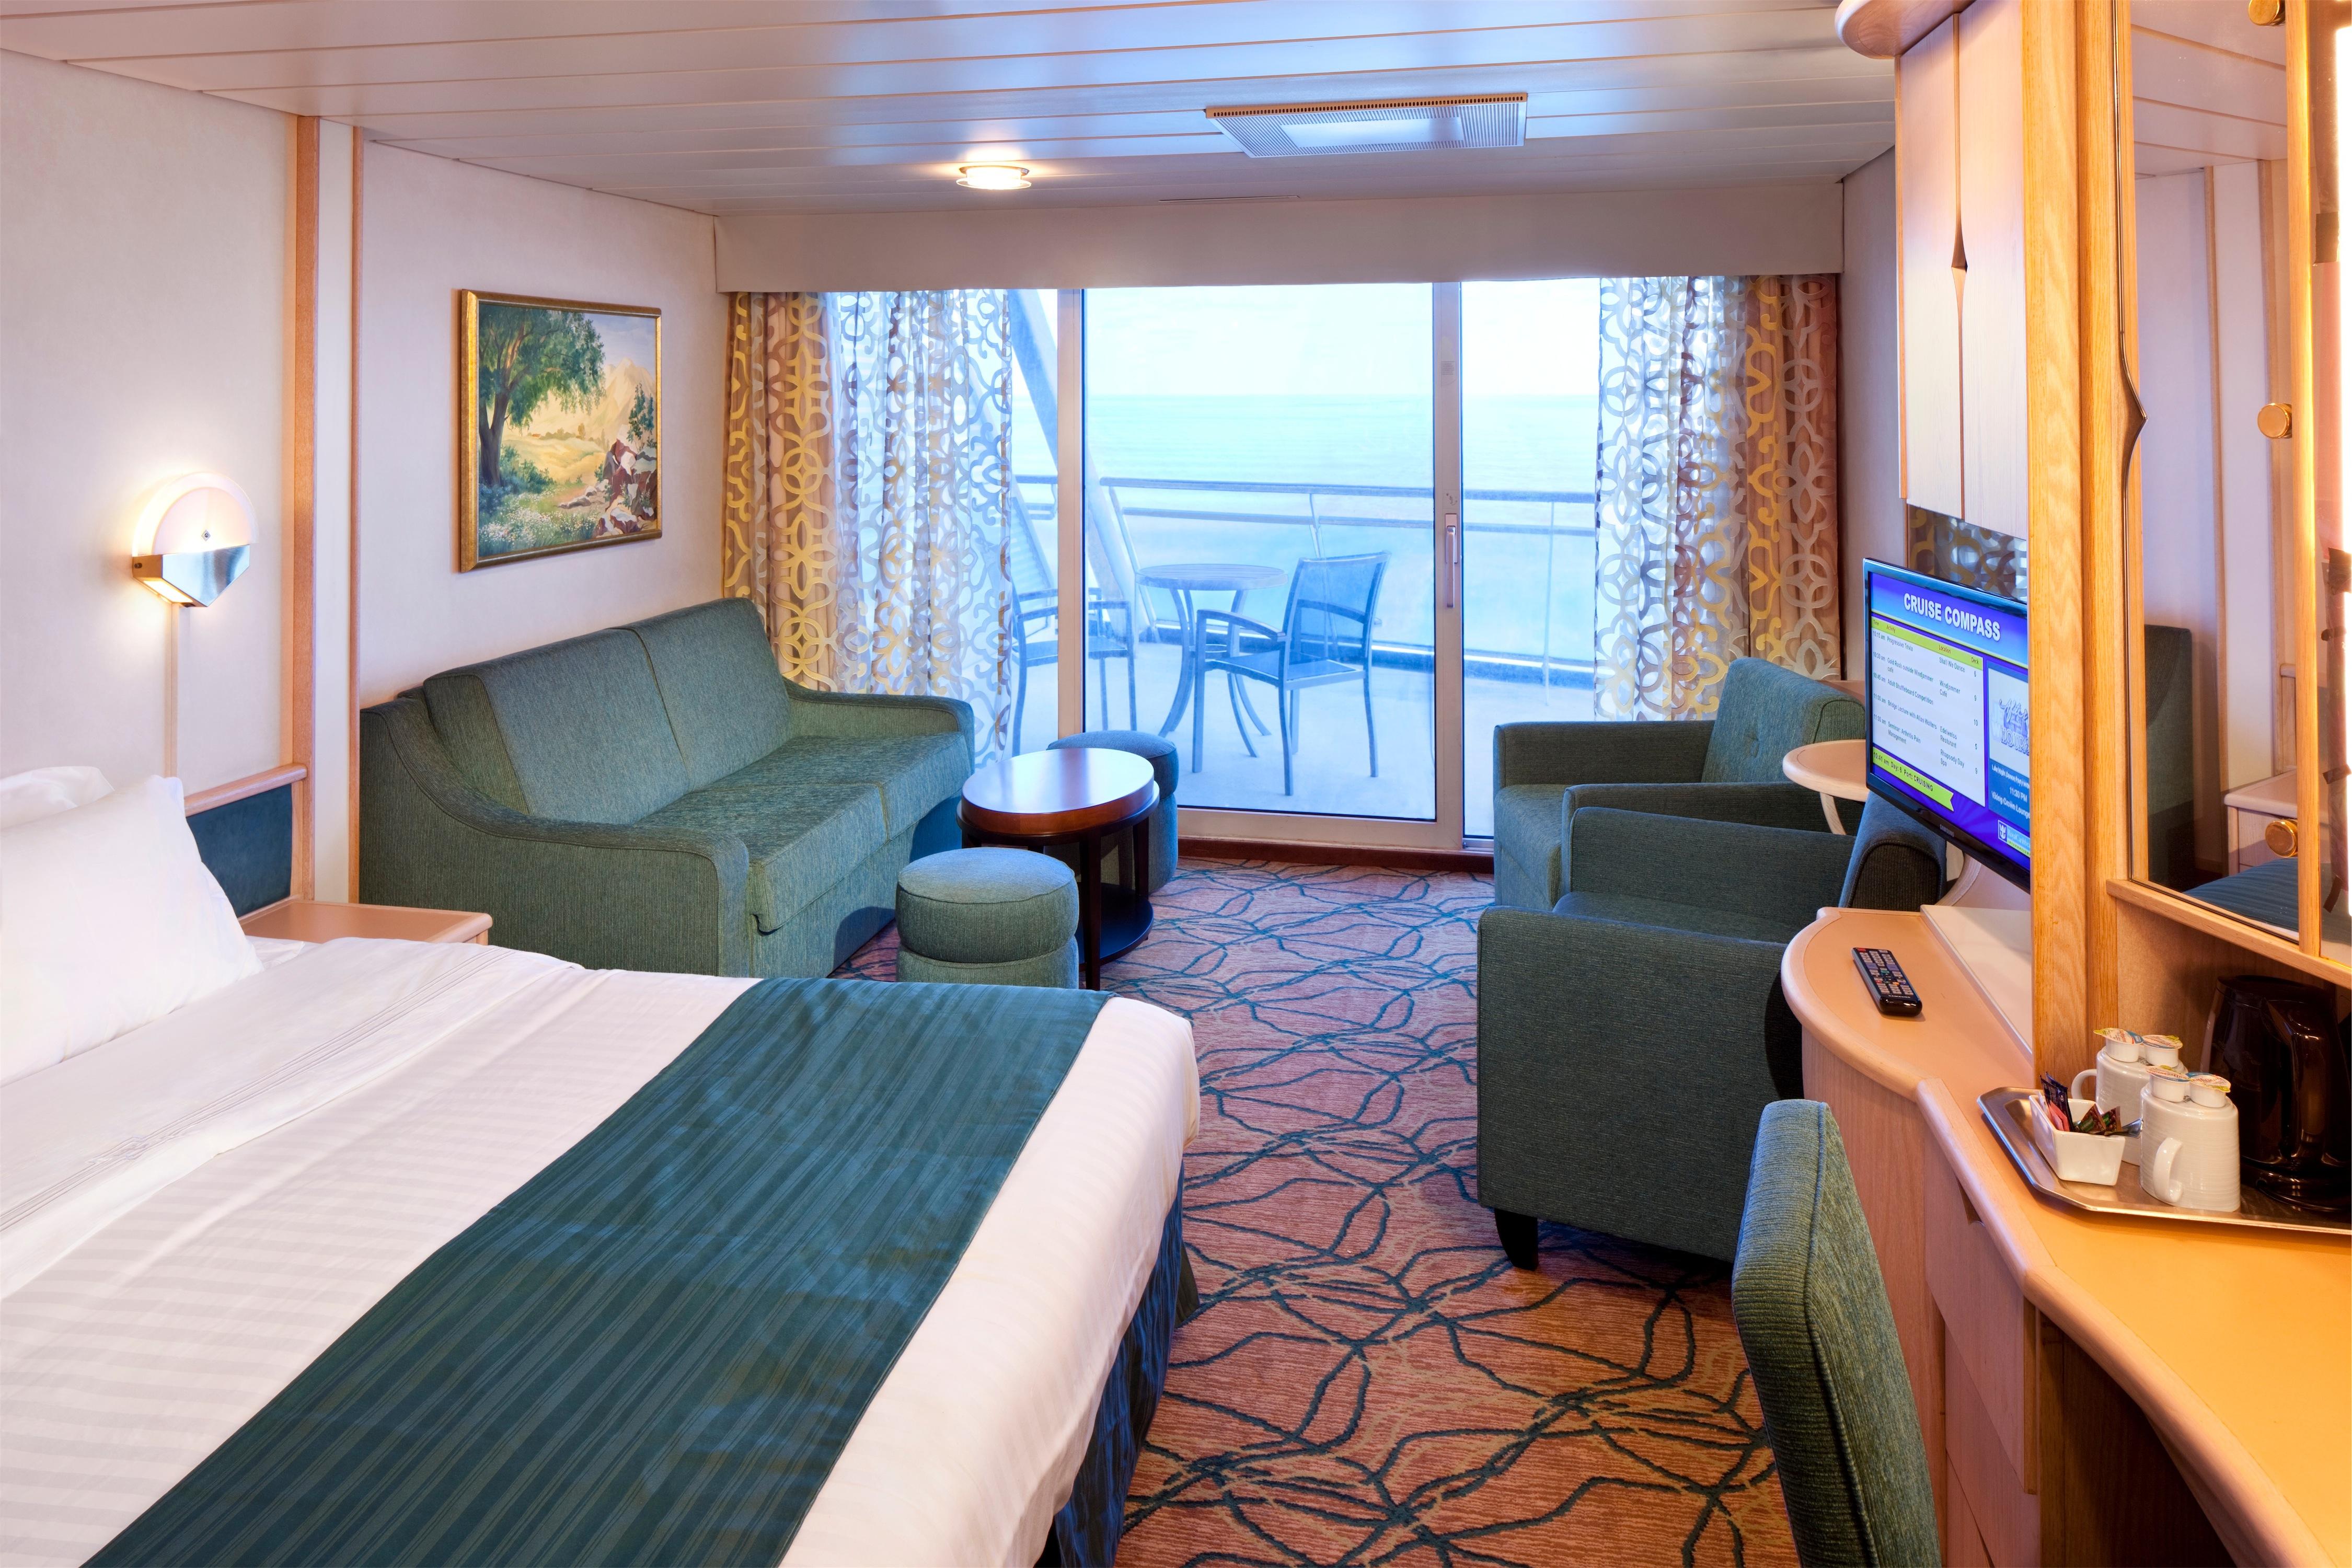 Royal Caribbean International Rhapsody of the Seas Accommodation Junior Suite 1.jpg